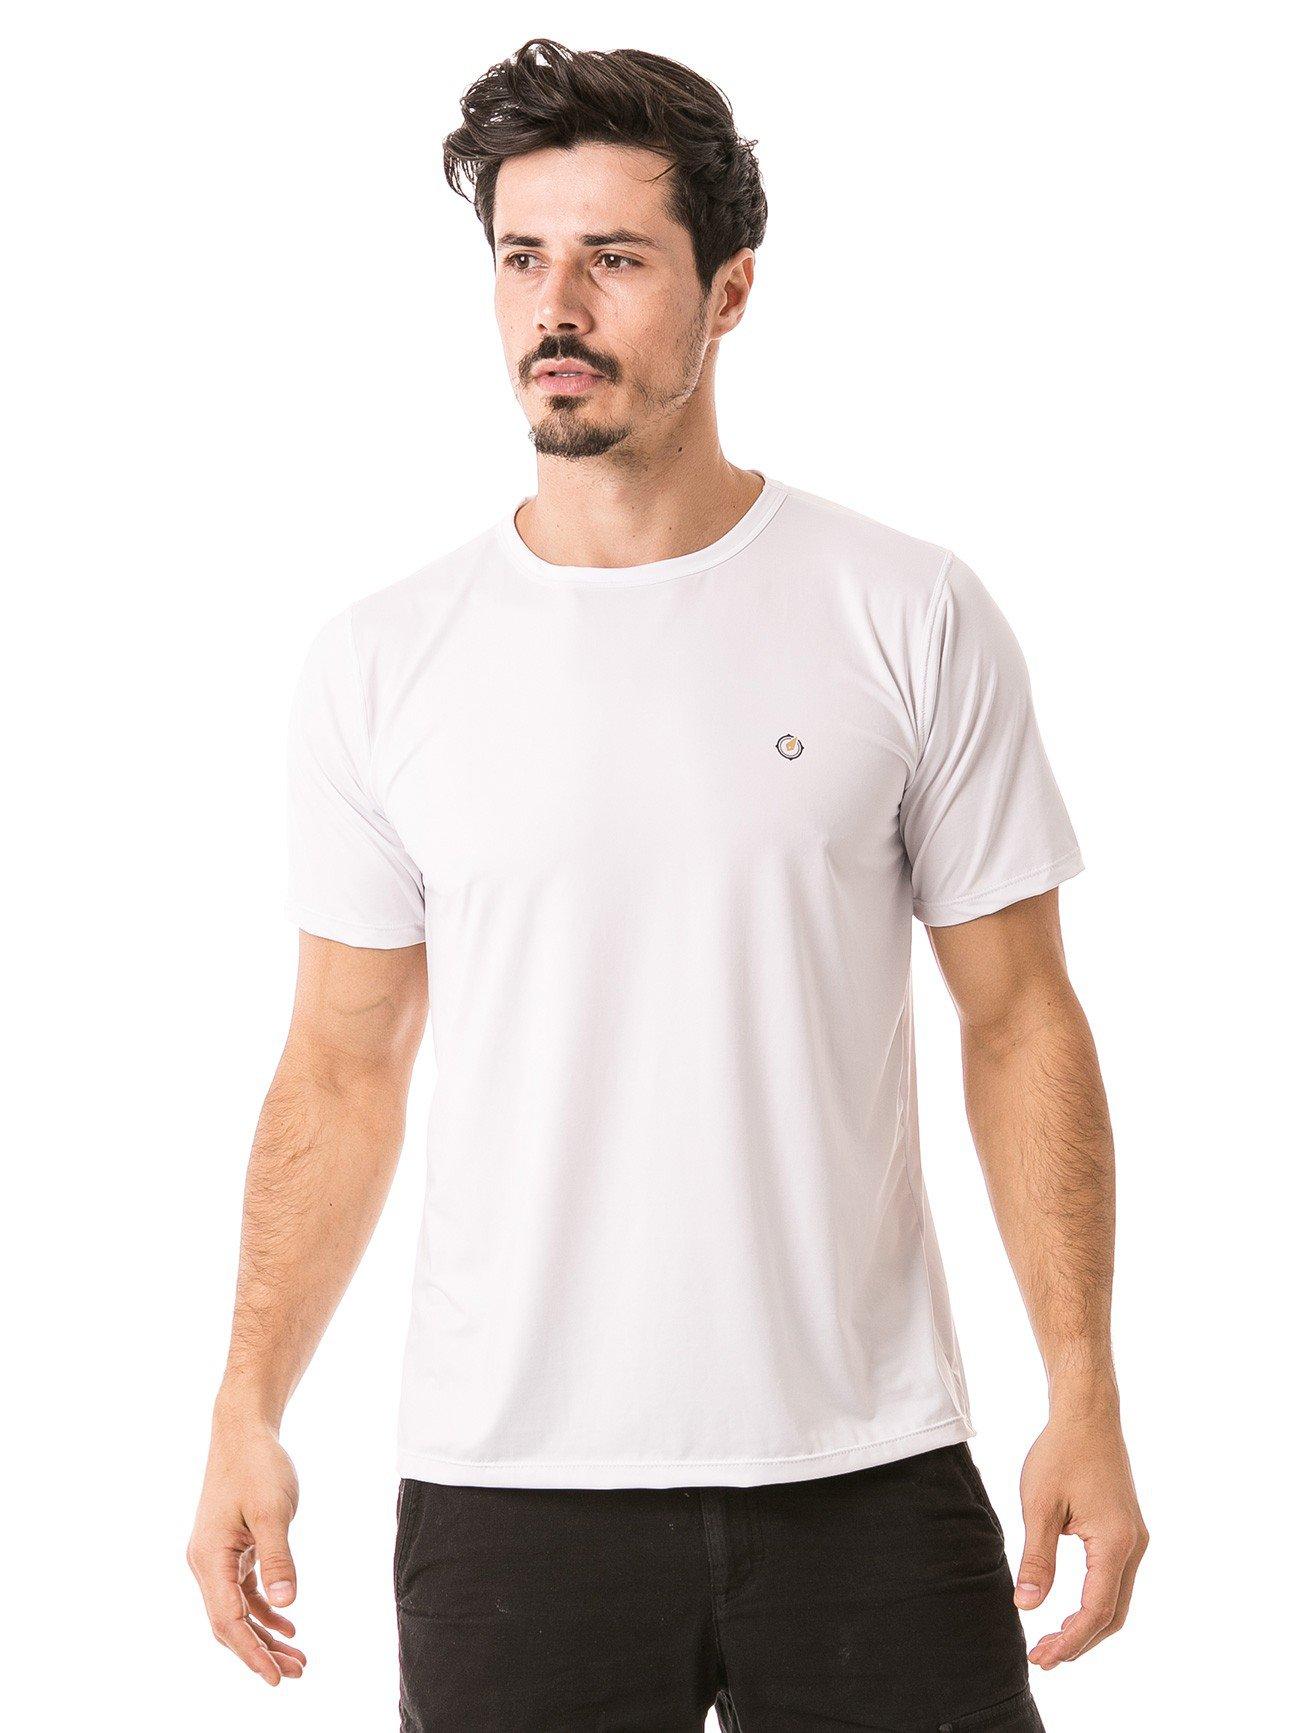 masculina t shirt curta ice branca lateral b